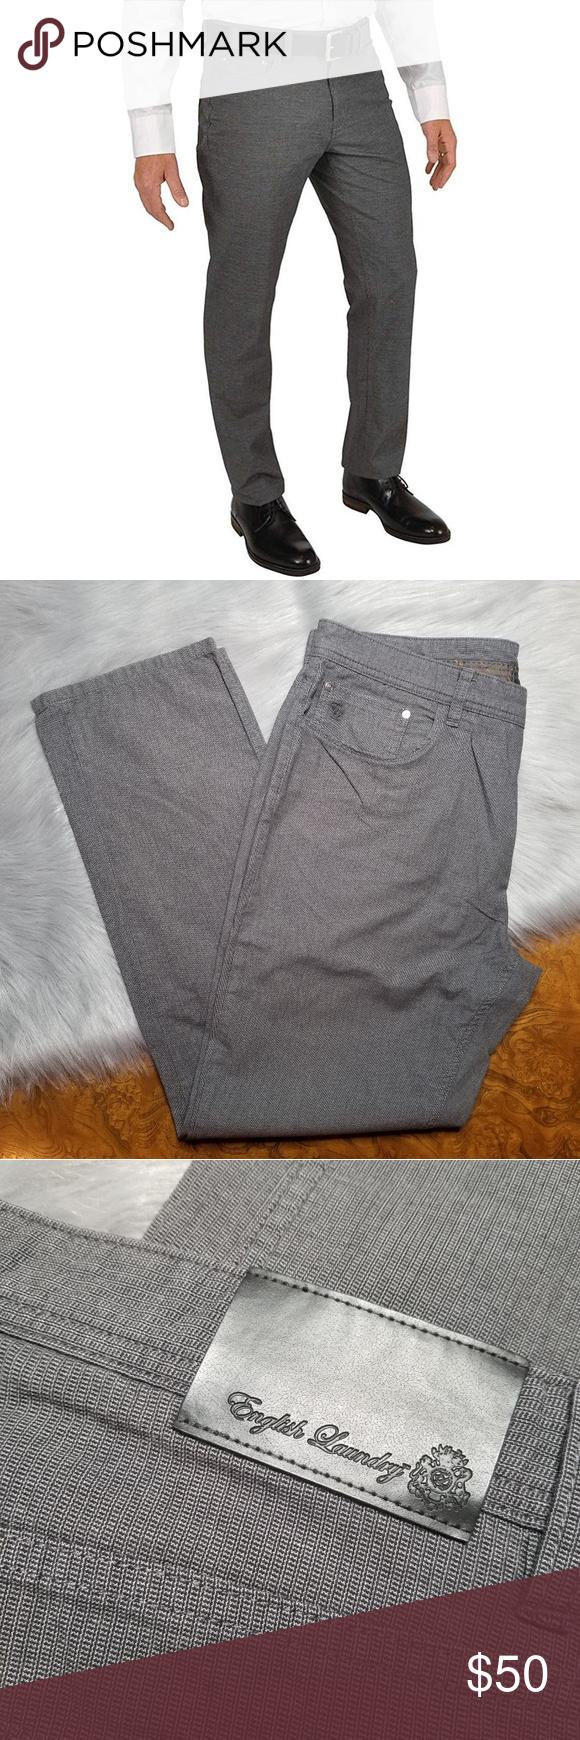 English Laundry Casual Walker Pants 36x32 English Laundry